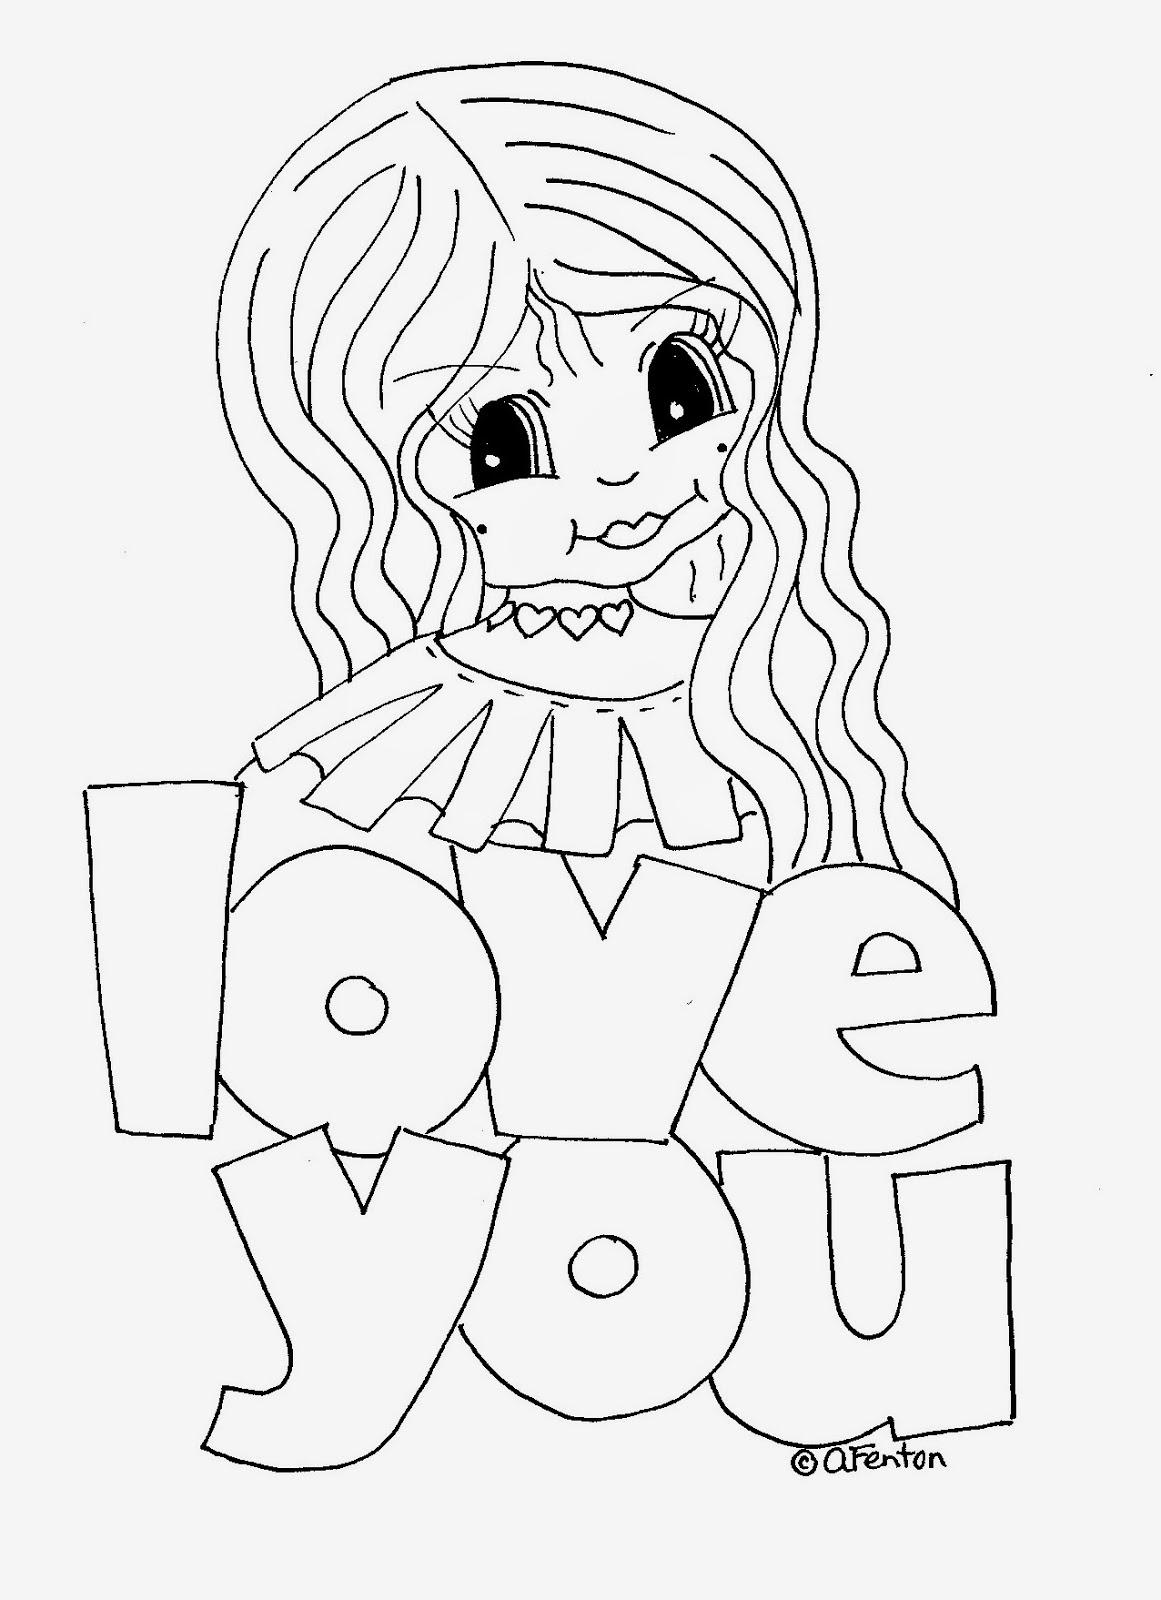 http://4.bp.blogspot.com/-bFEtr8se5O0/Uu6_9GjEQpI/AAAAAAAACnE/Klo4_sIFnMg/s1600/Suzy+-+Love+You+.+Anne's+Digital+Art.jpg